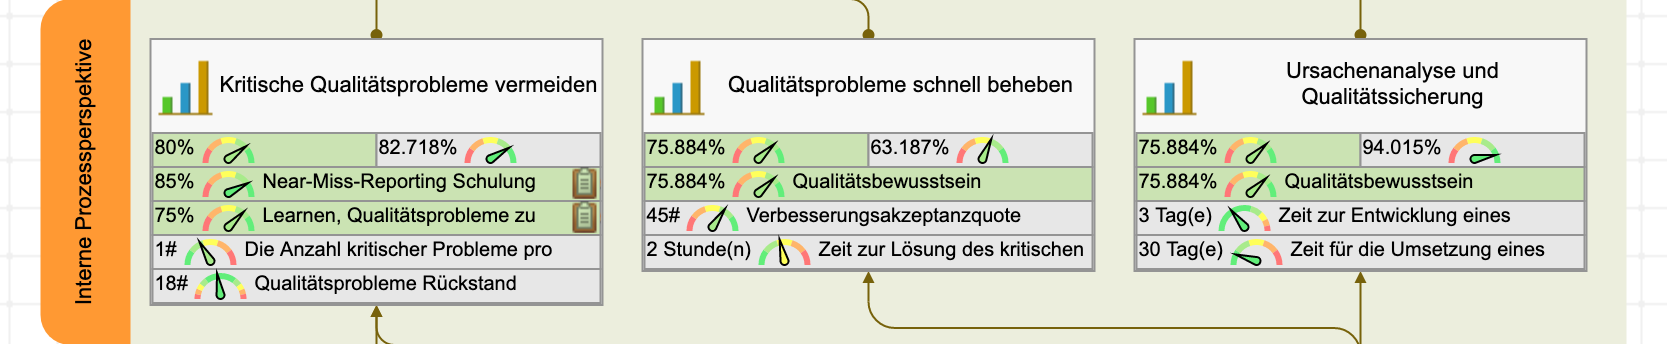 Qualitäts-Scorecard - interne Perspektive